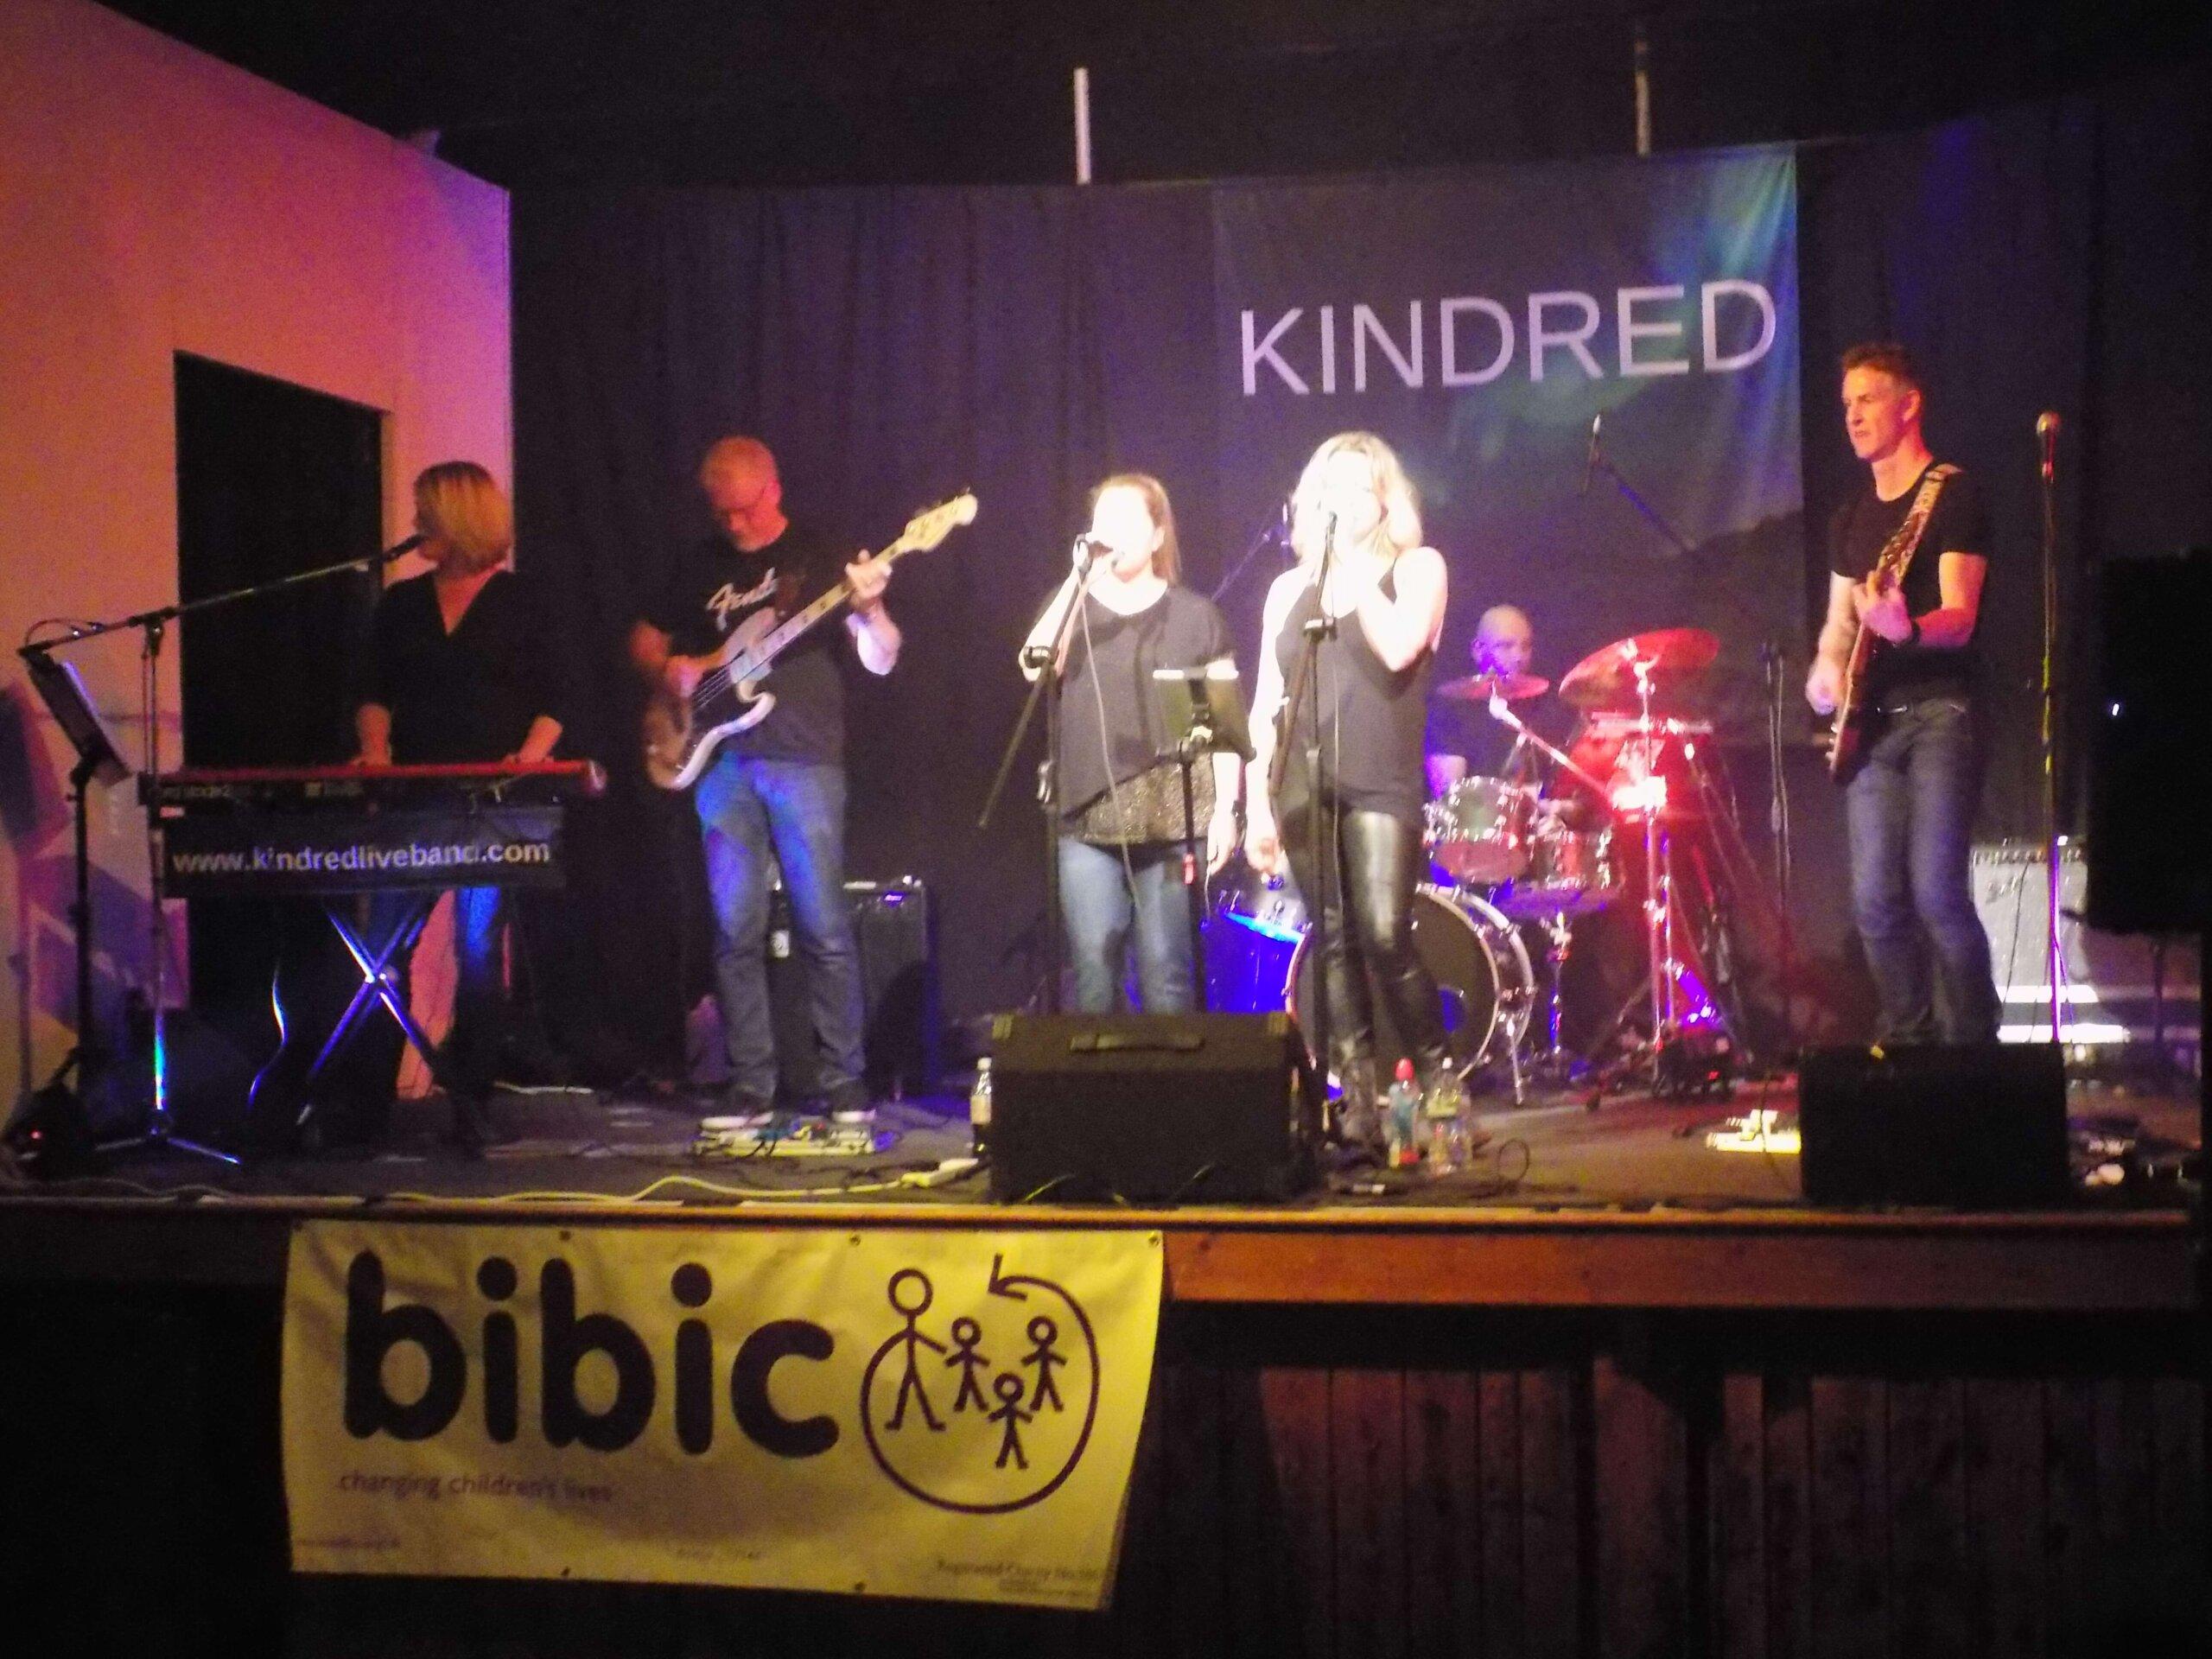 Kindred charity gig bibic